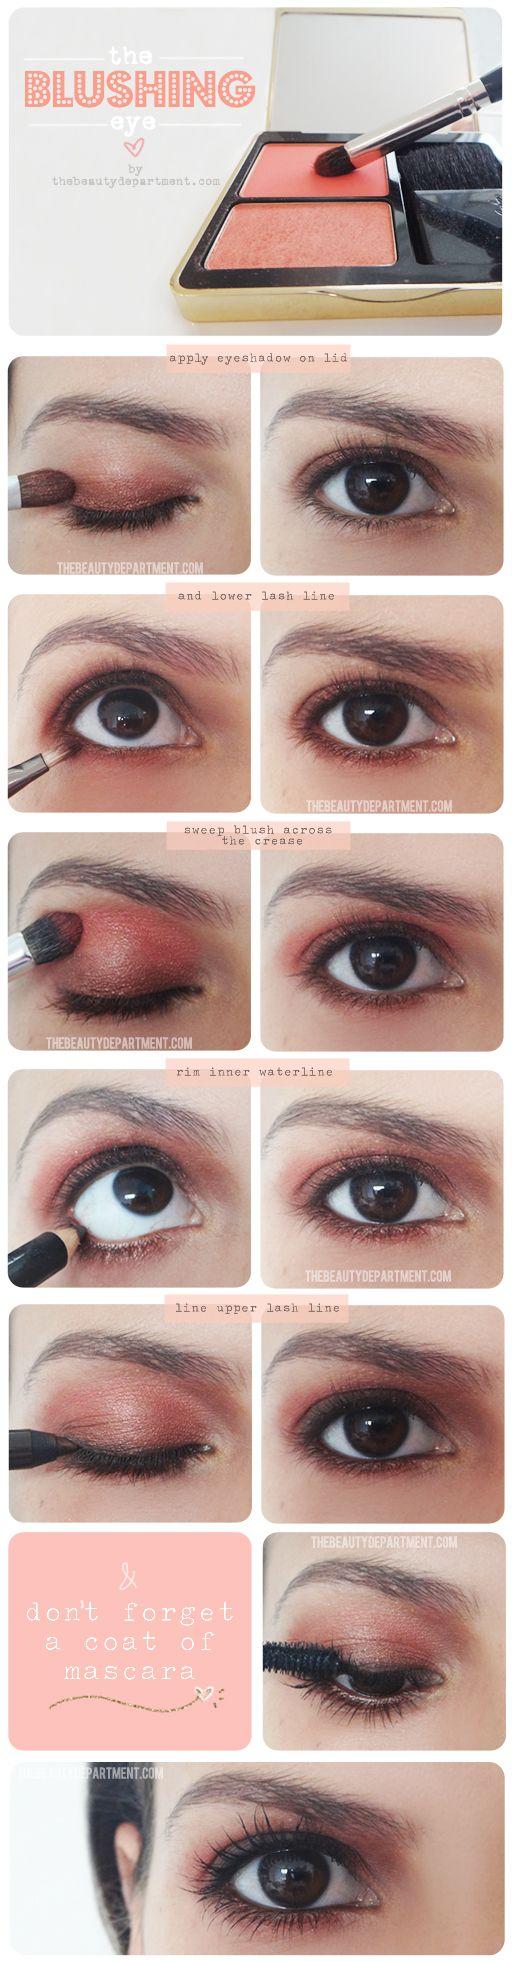 Make an every day eye shadow pop by adding a little blush!Makeup Tutorials, Eye Makeup, Double Duty, Makeup Tricks, Beautiful Department, Eye Shadows, Blushes Eye, Eyeshadows, Diy Makeup